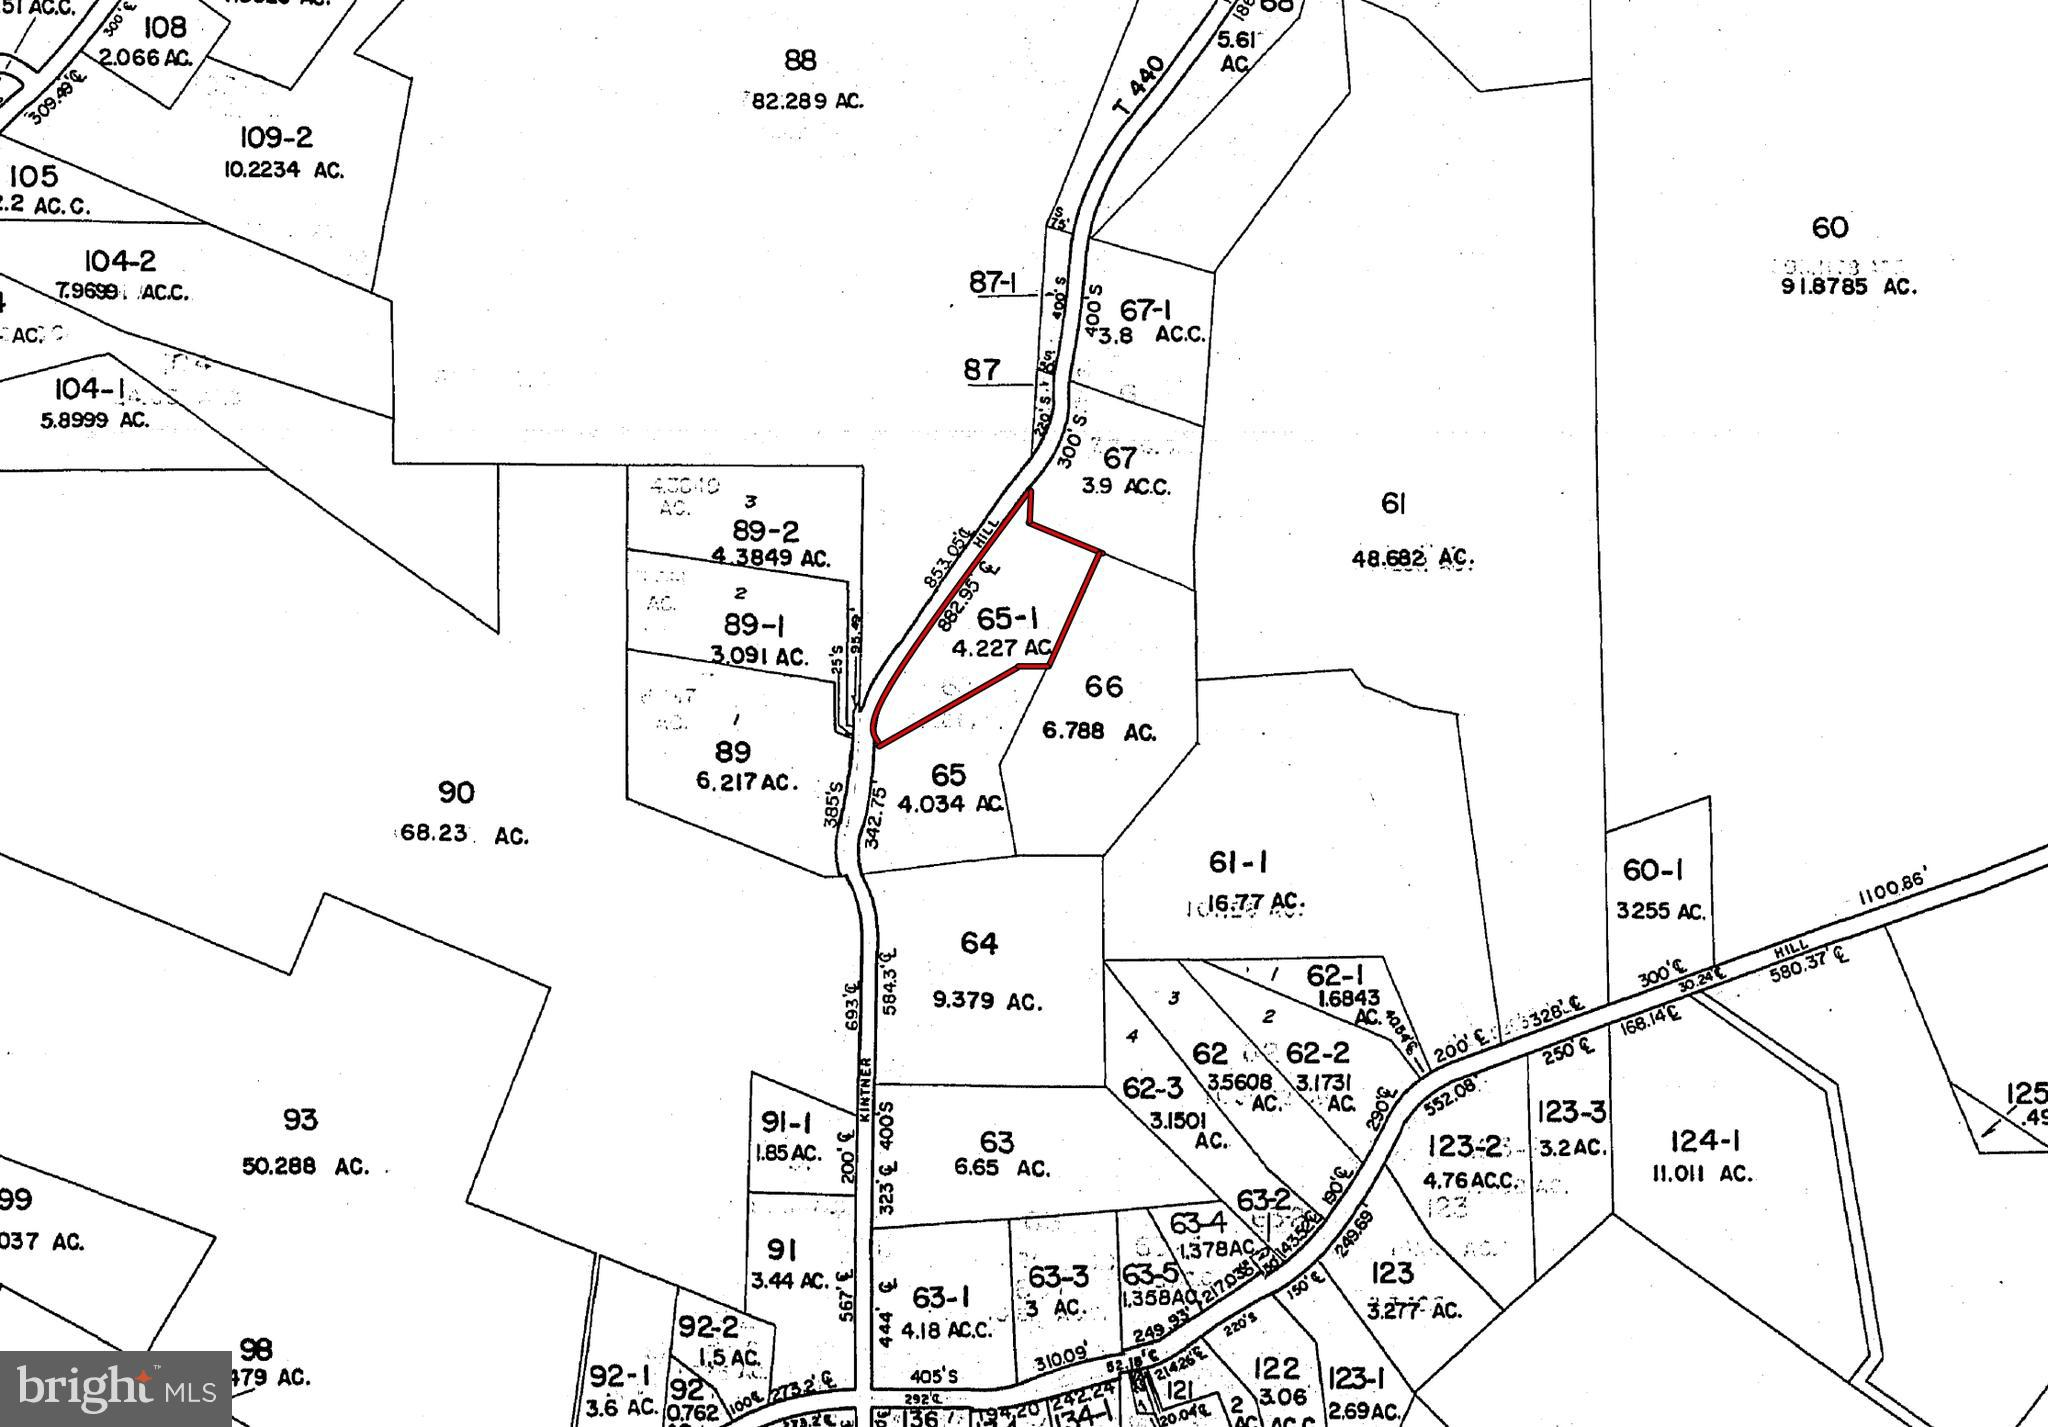 Lot 065 KINTNER HILL ROAD, NOCKAMIXON, PA 18972